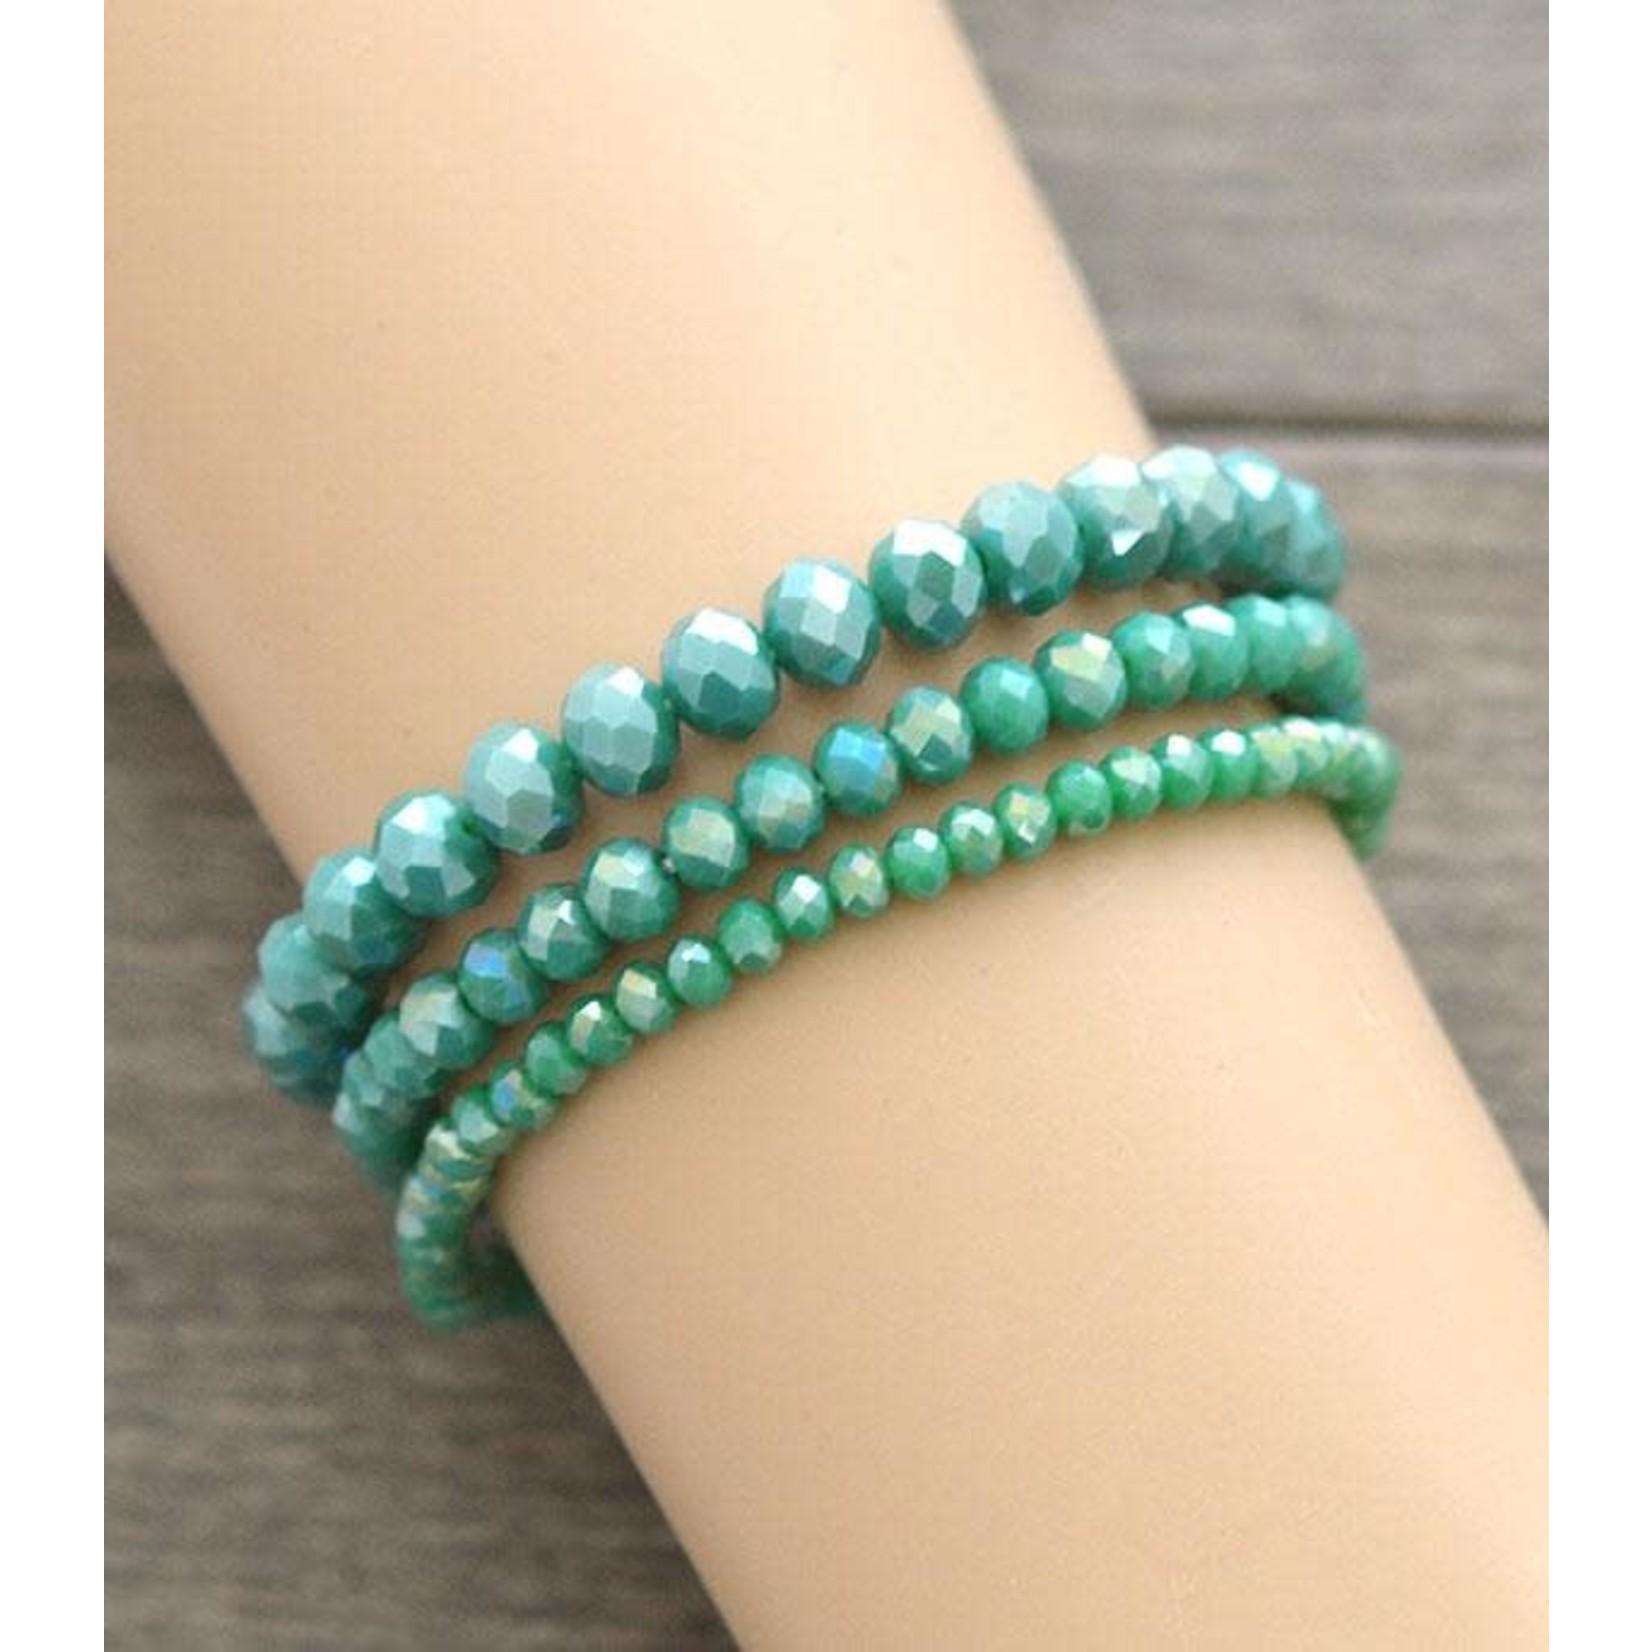 Encour Culture 3 Piece Crystal Bead Bracelet